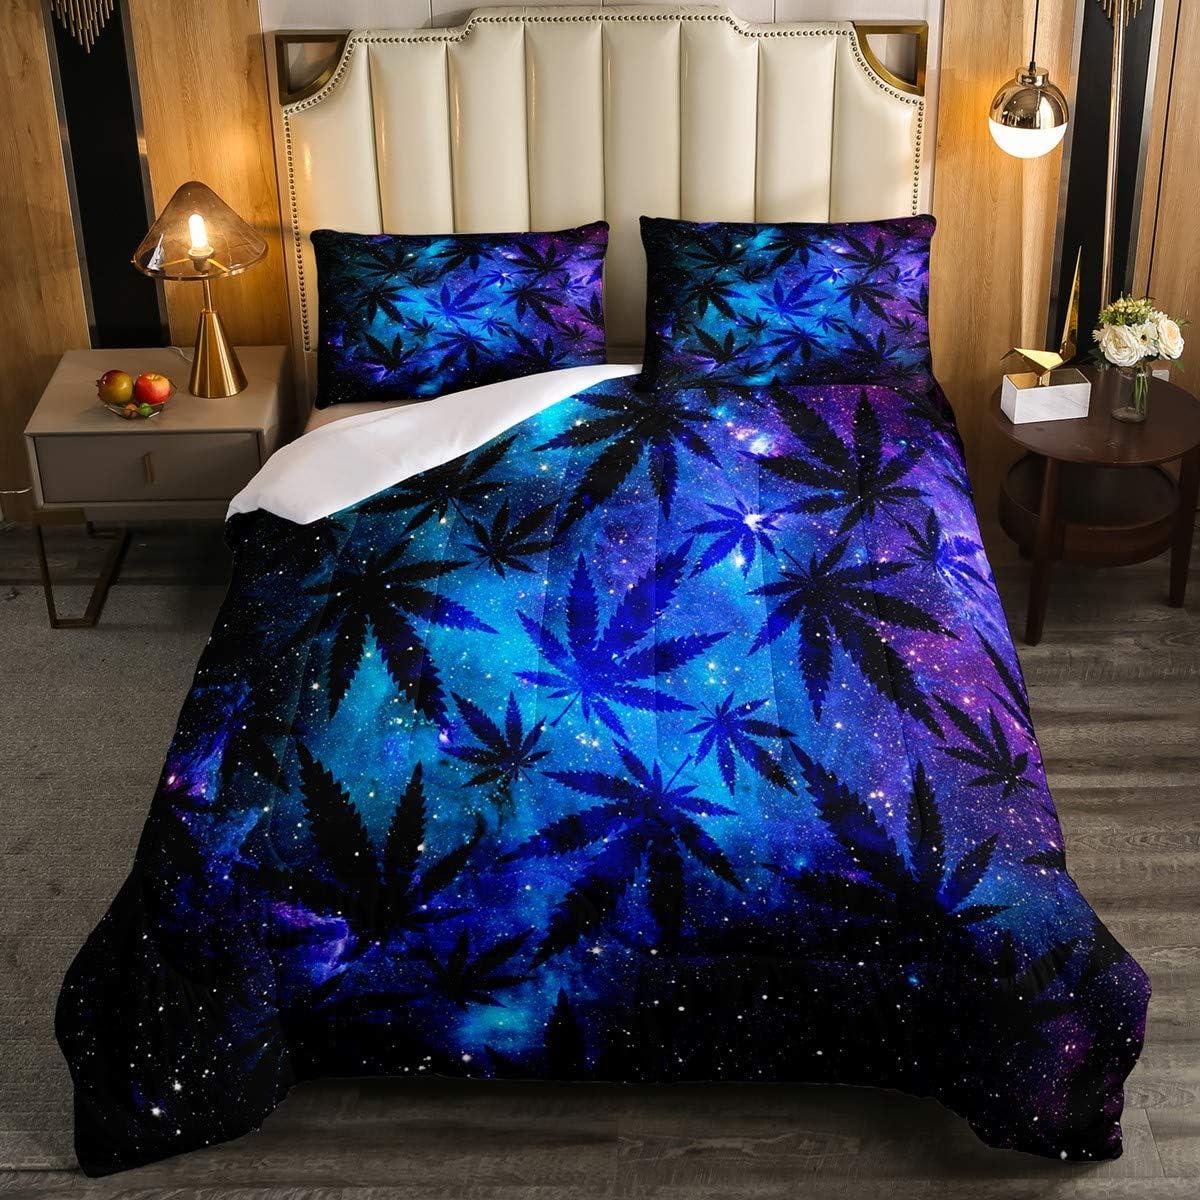 5 ☆ very popular Feelyou Marijuana Leaf 2021 Comforter Set Size Galaxy Cannabis Twin L